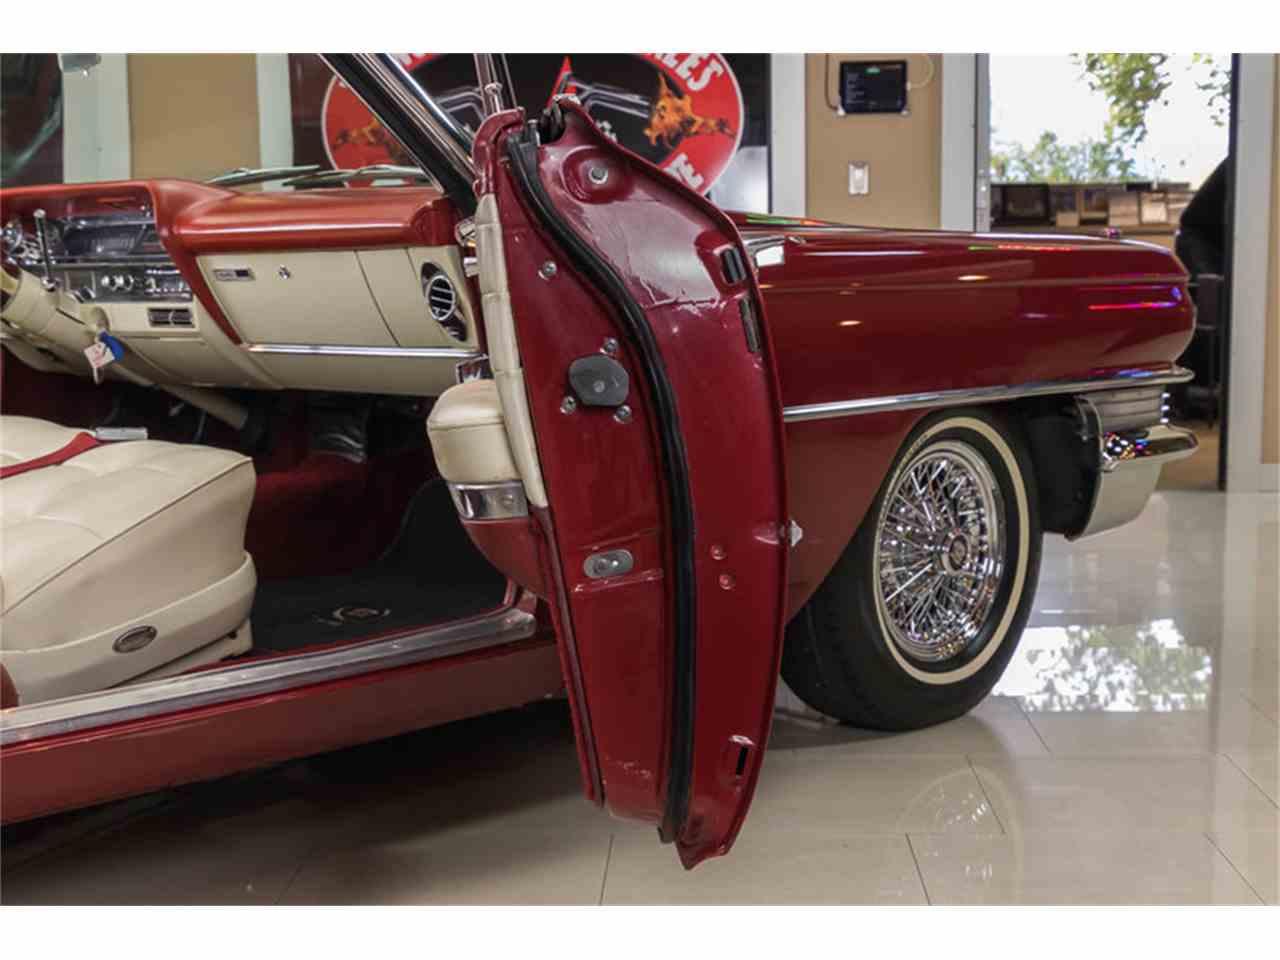 Large Picture of 1963 Cadillac DeVille - $64,900.00 - LVCM